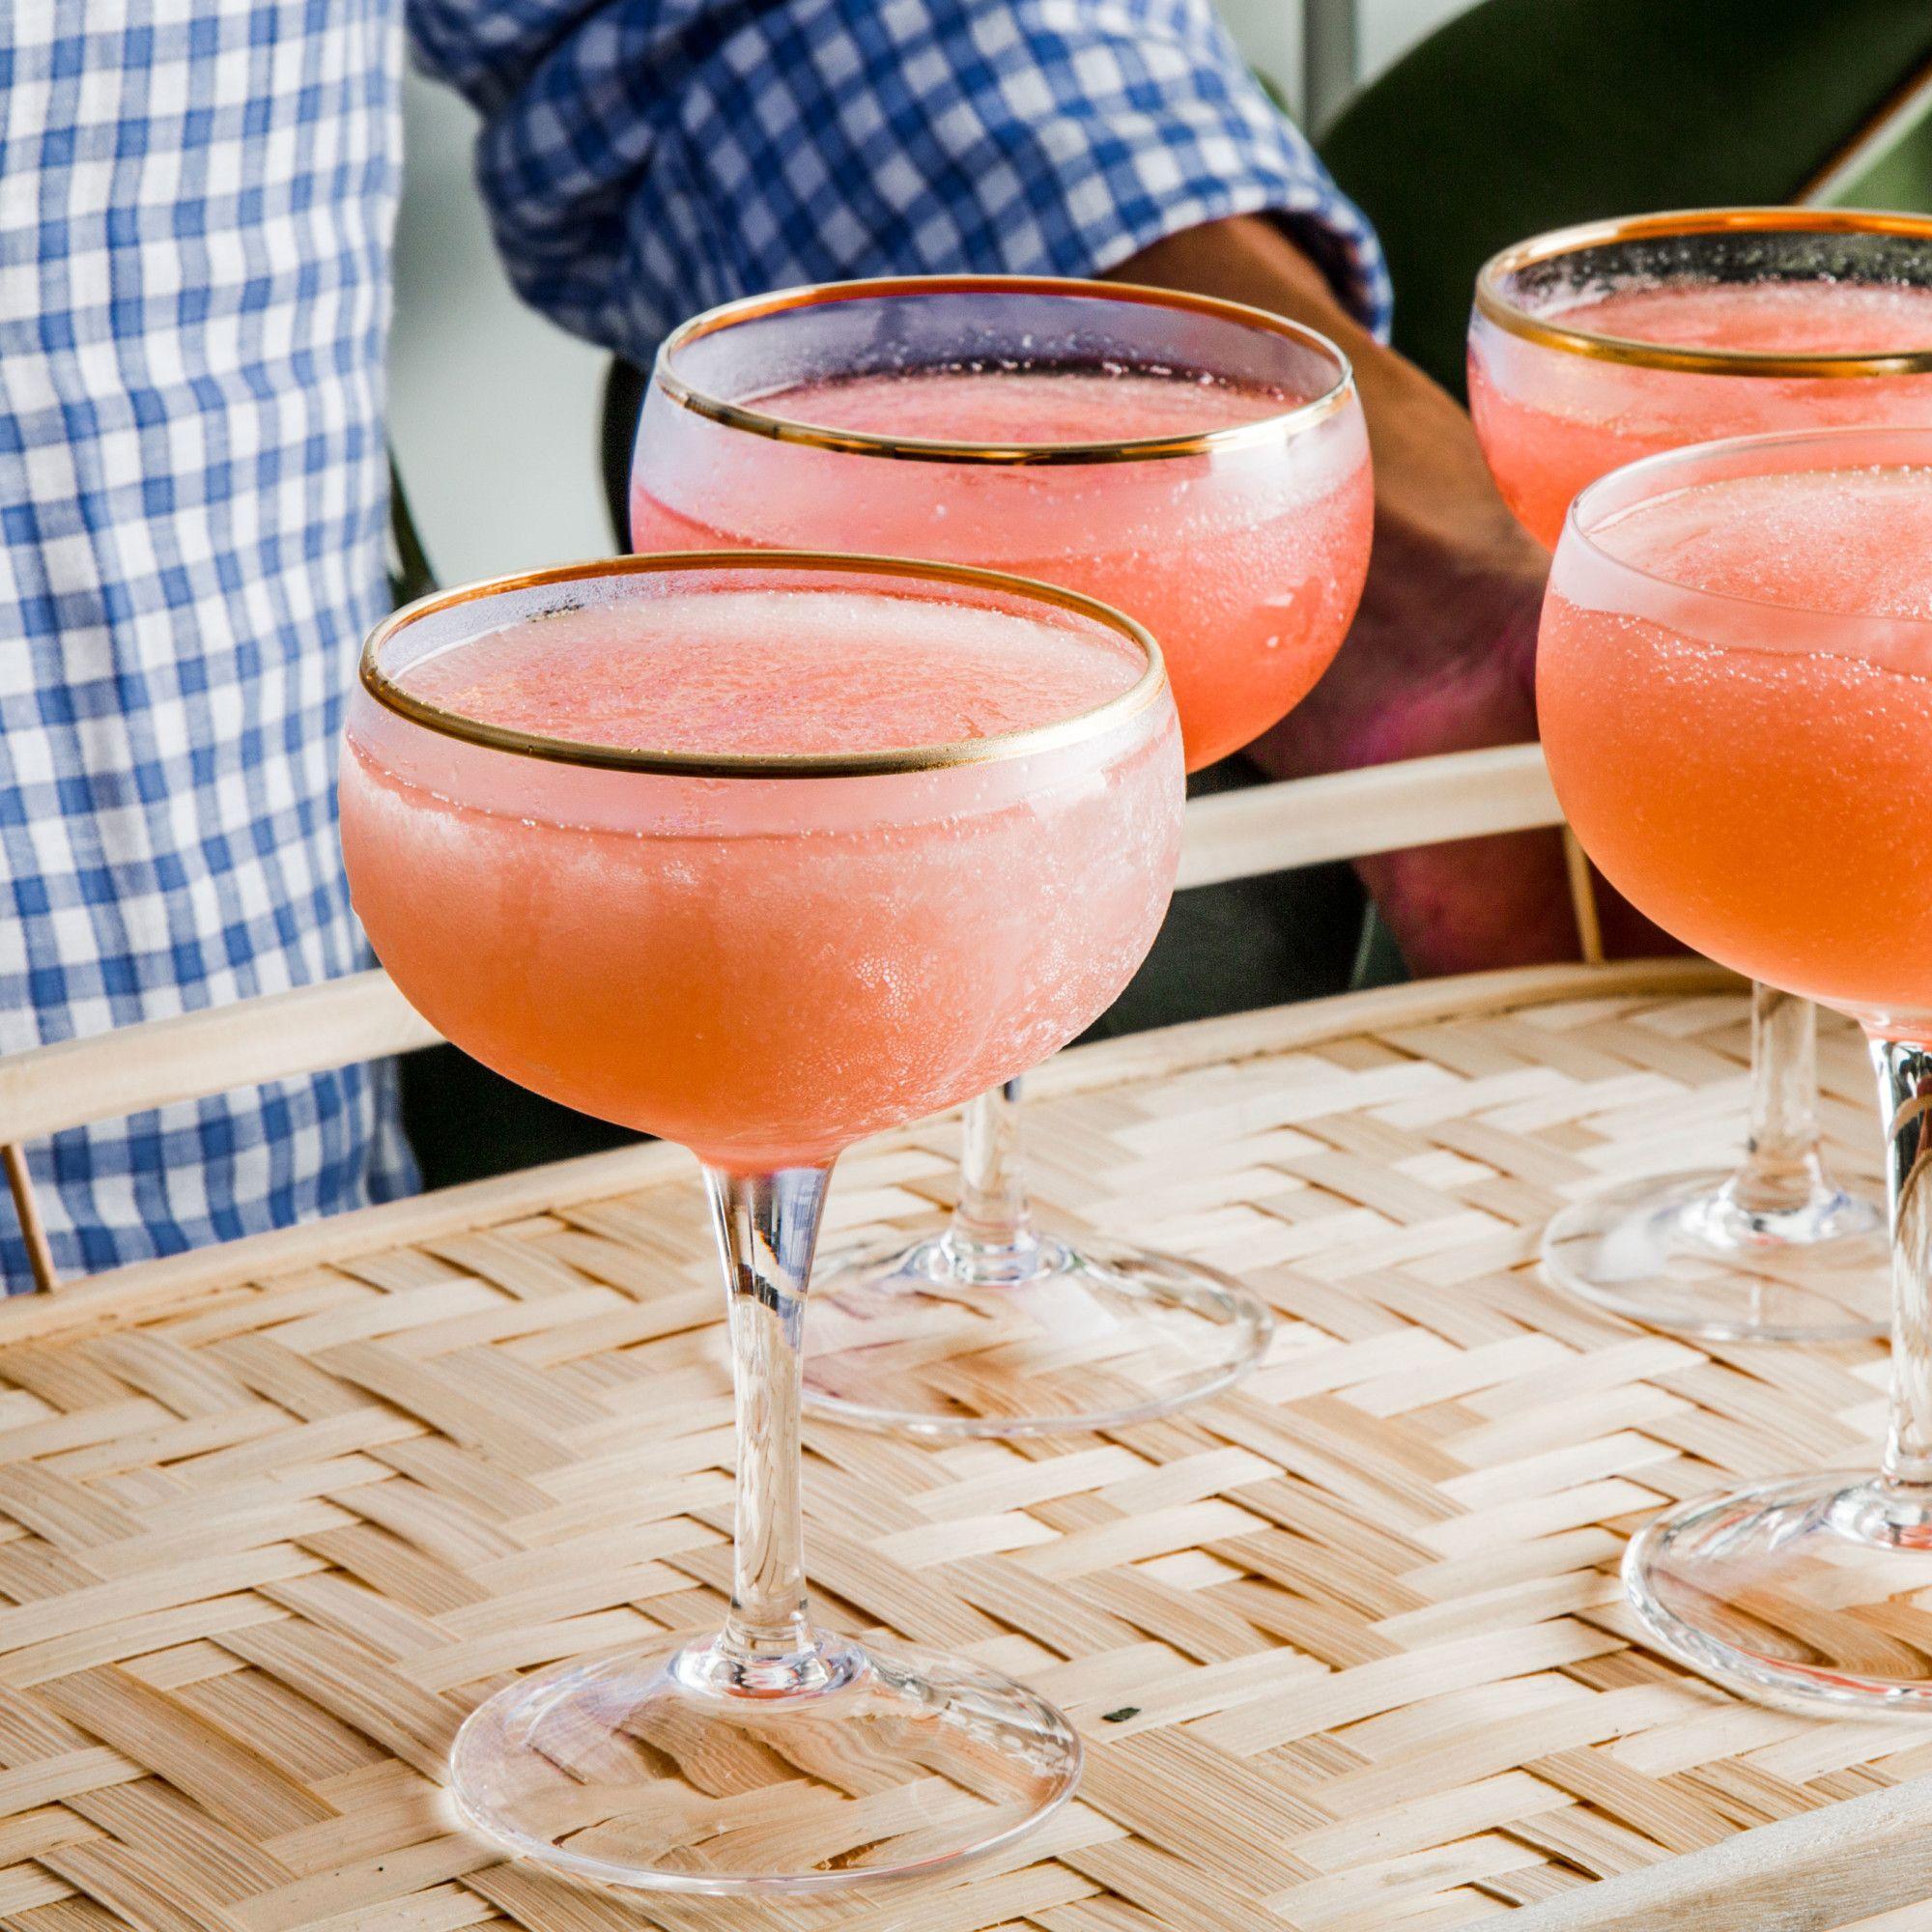 die besten 25 frozen rose ideen auf pinterest sommerwein getr nke lustige alkoholgetr nke. Black Bedroom Furniture Sets. Home Design Ideas